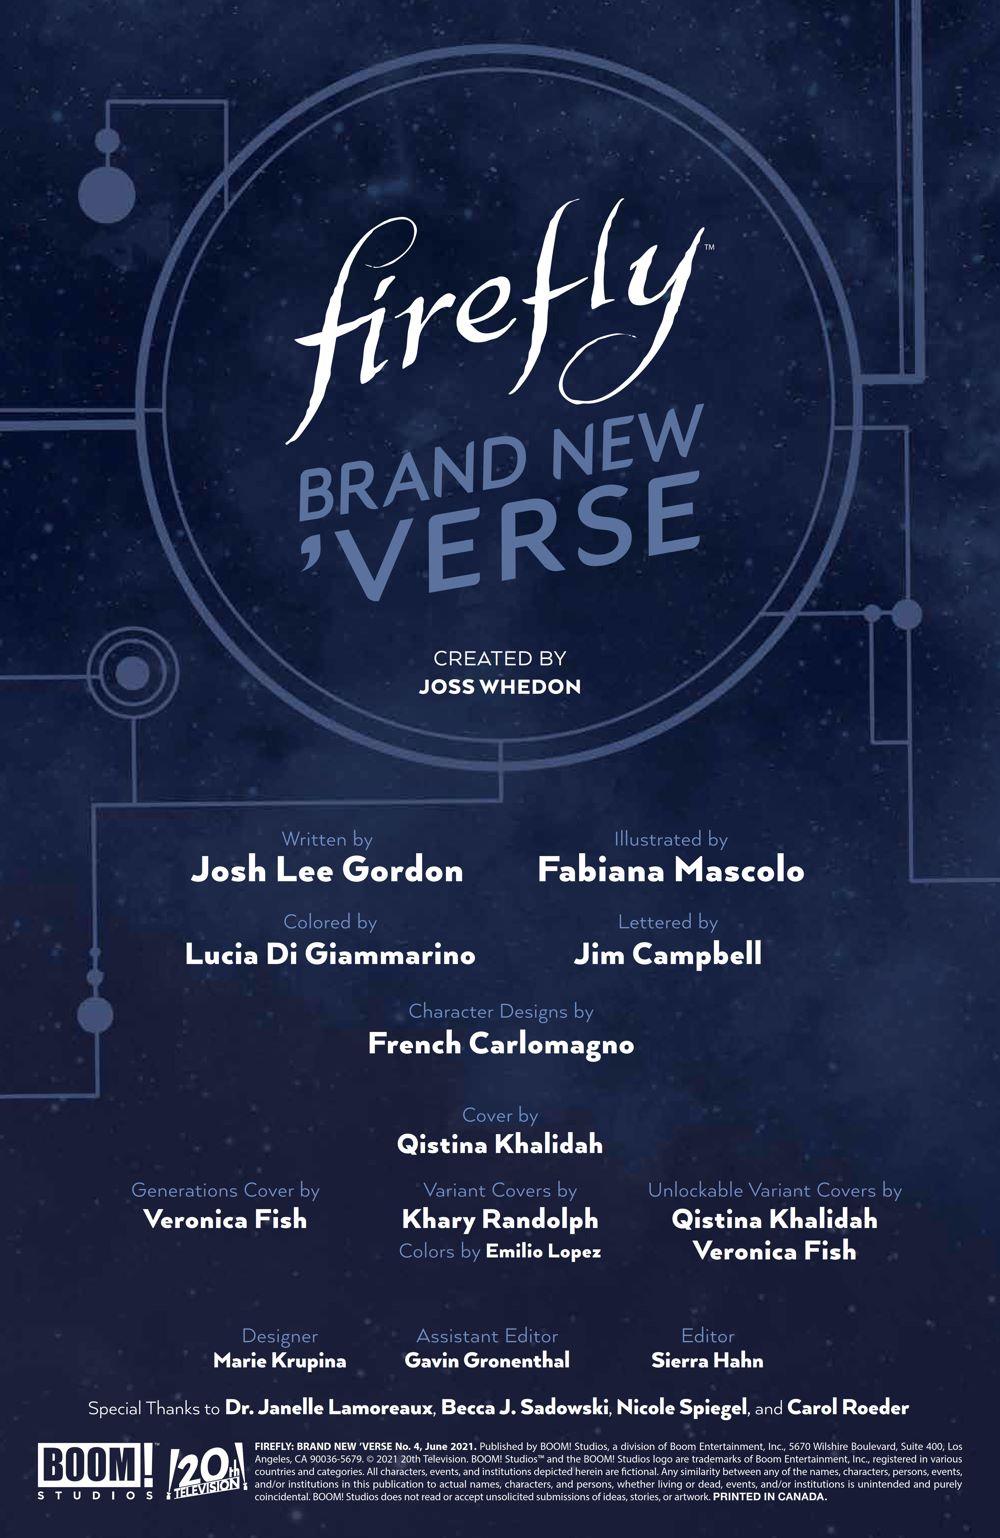 Firefly_BrandNewVerse_004_PRESS_2 ComicList Previews: FIREFLY A BRAND NEW 'VERSE #4 (OF 6)